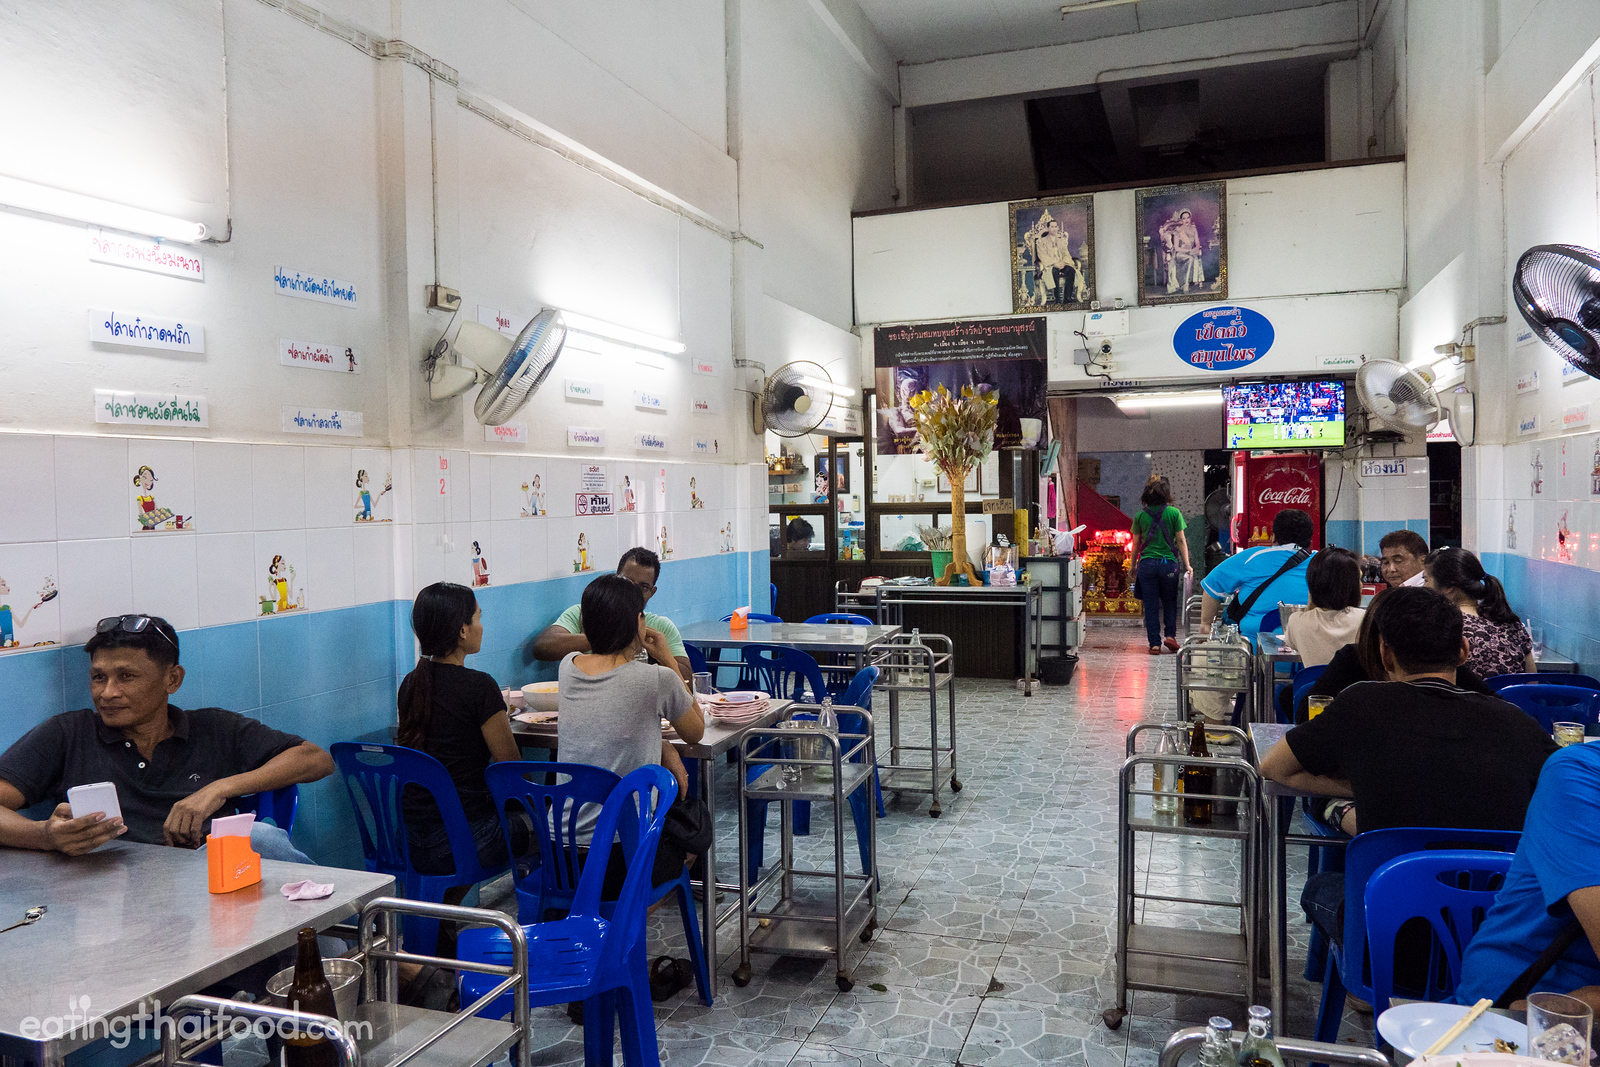 Yot Khao Tom (ร้านยศข้าวต้ม)